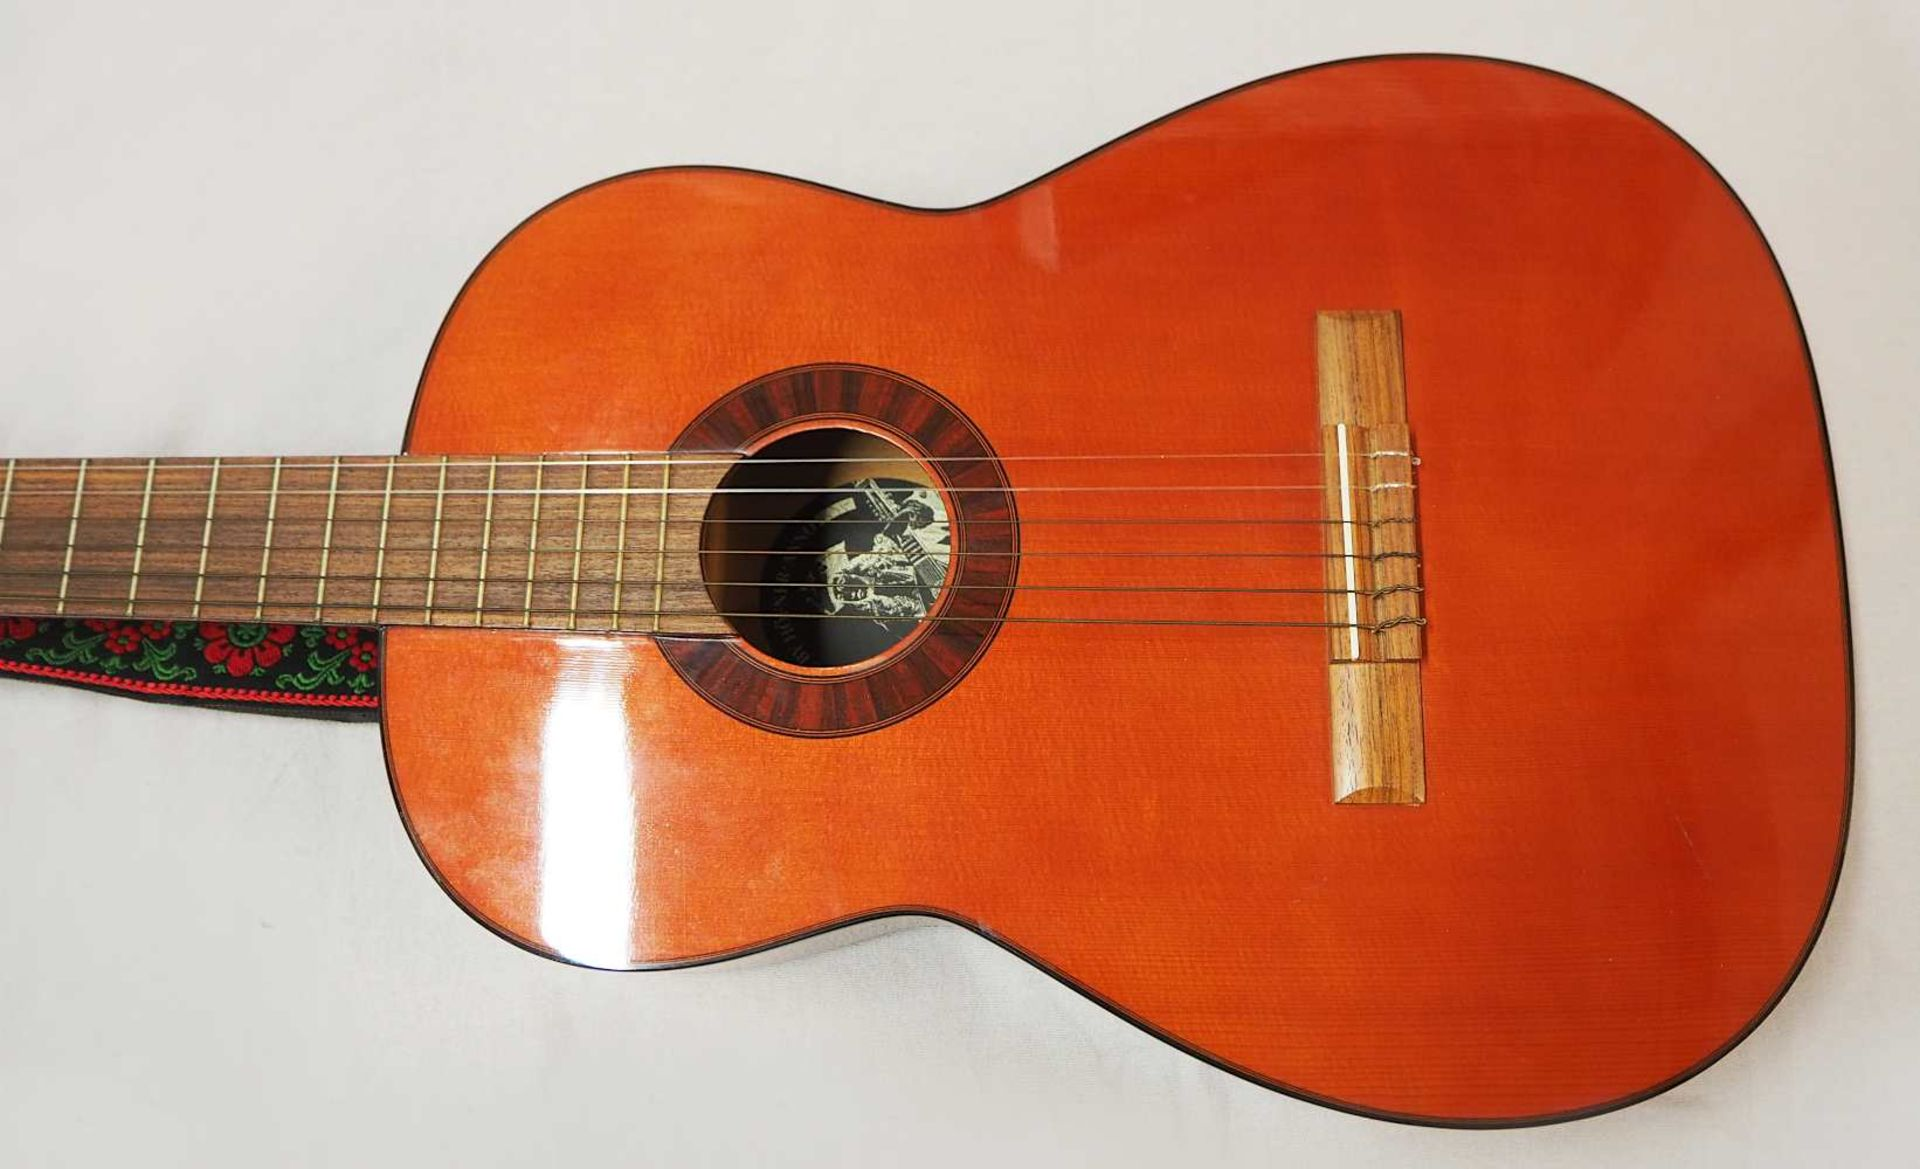 1 Konzert-Gitarre HÖFNER Modellnummer: 4840, wohl z.T. Rosenholz min. intarsiert auf - Bild 4 aus 8